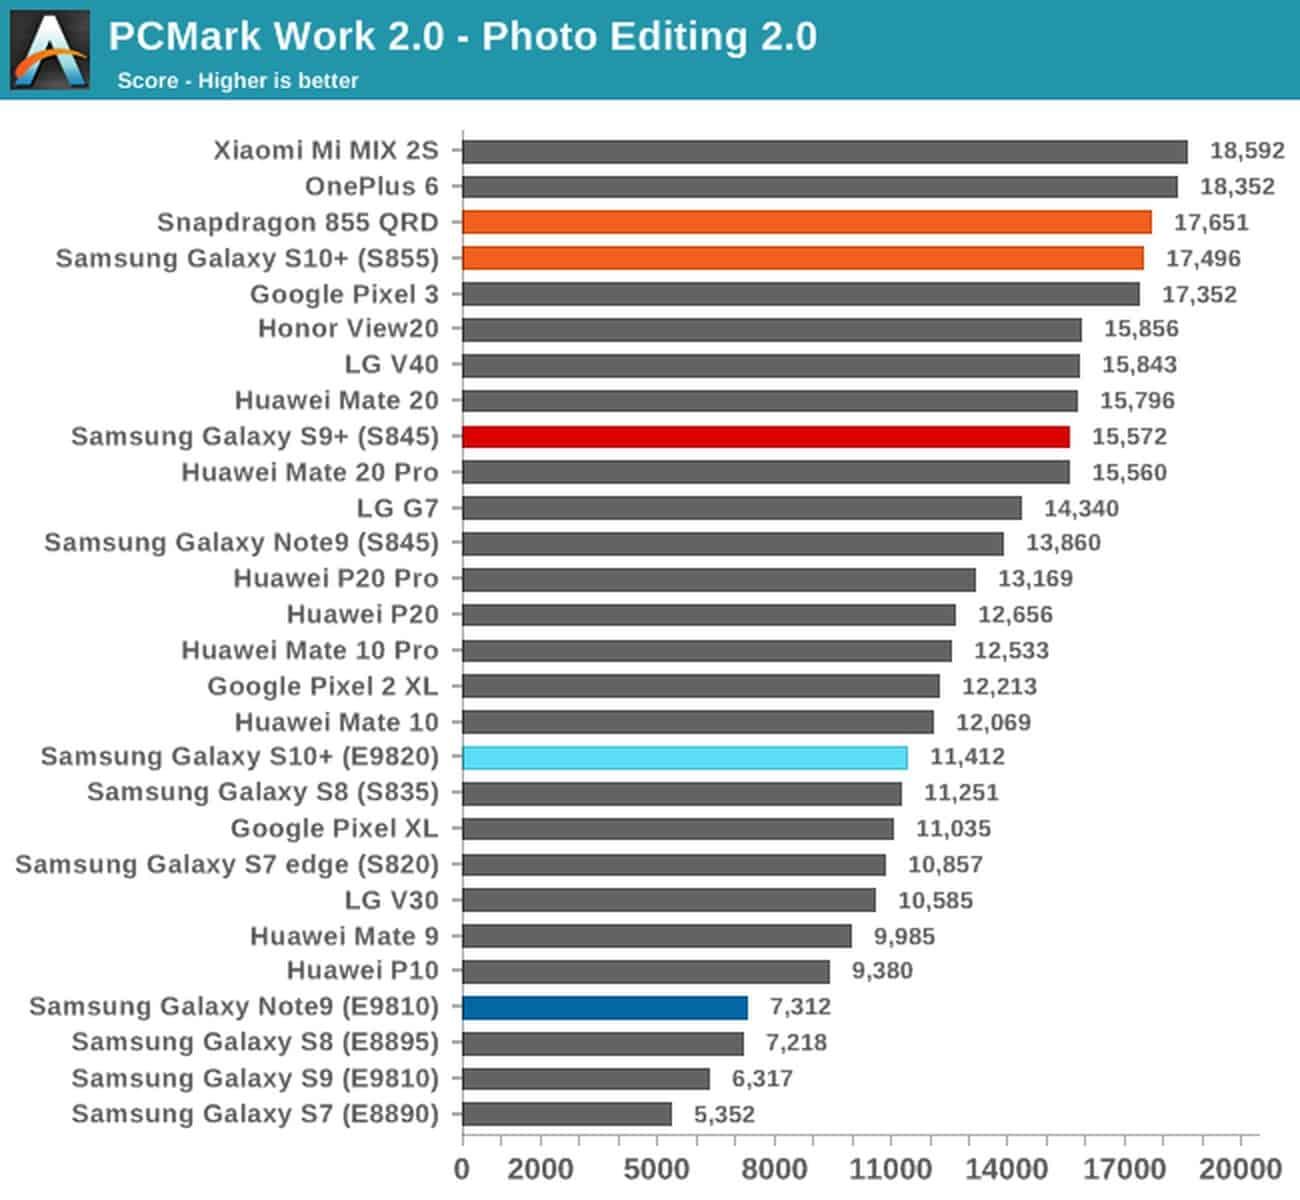 PCMark Galaxy S10 both SoC variants 4